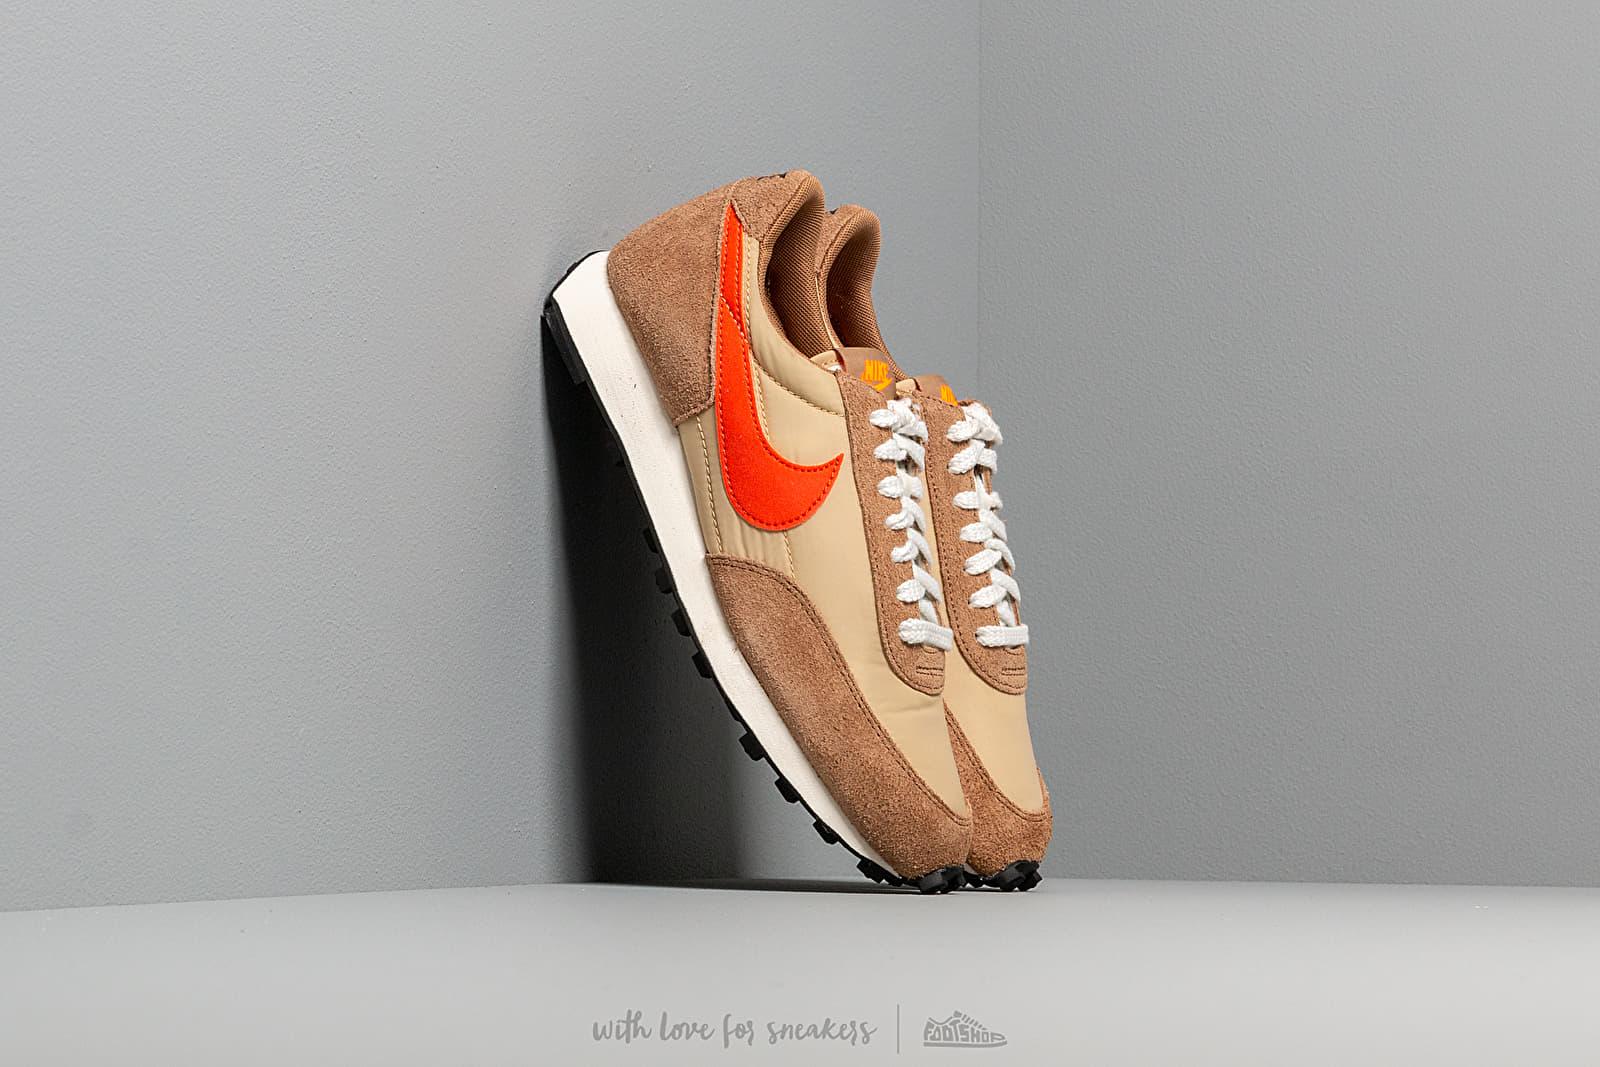 Zapatillas Hombre Nike Daybreak Sp Vegas Gold/ College Orange-Rocky Tan